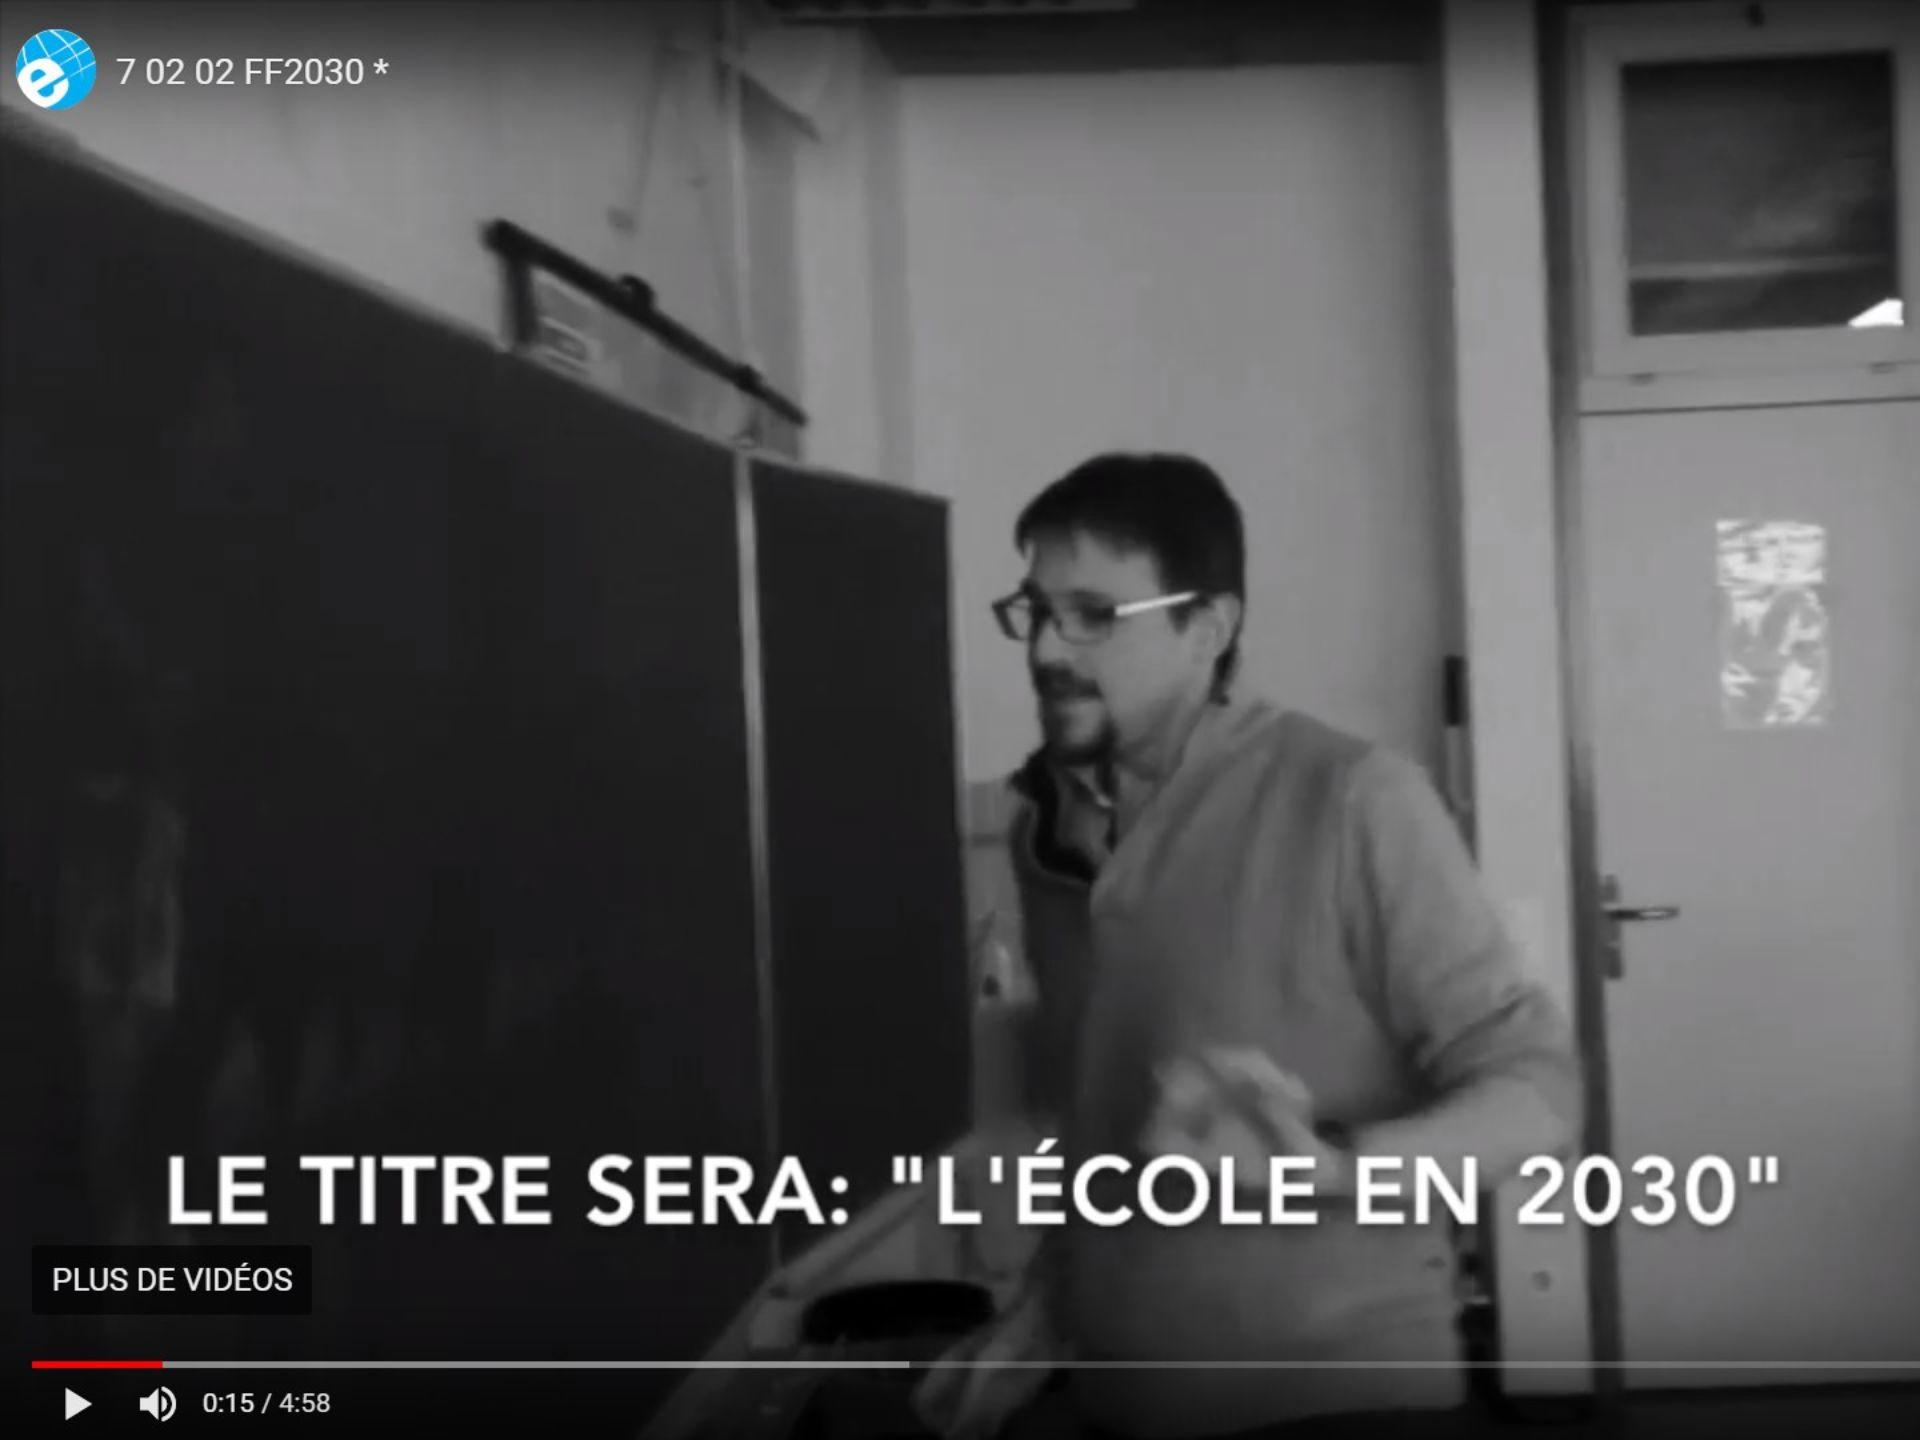 FF2030